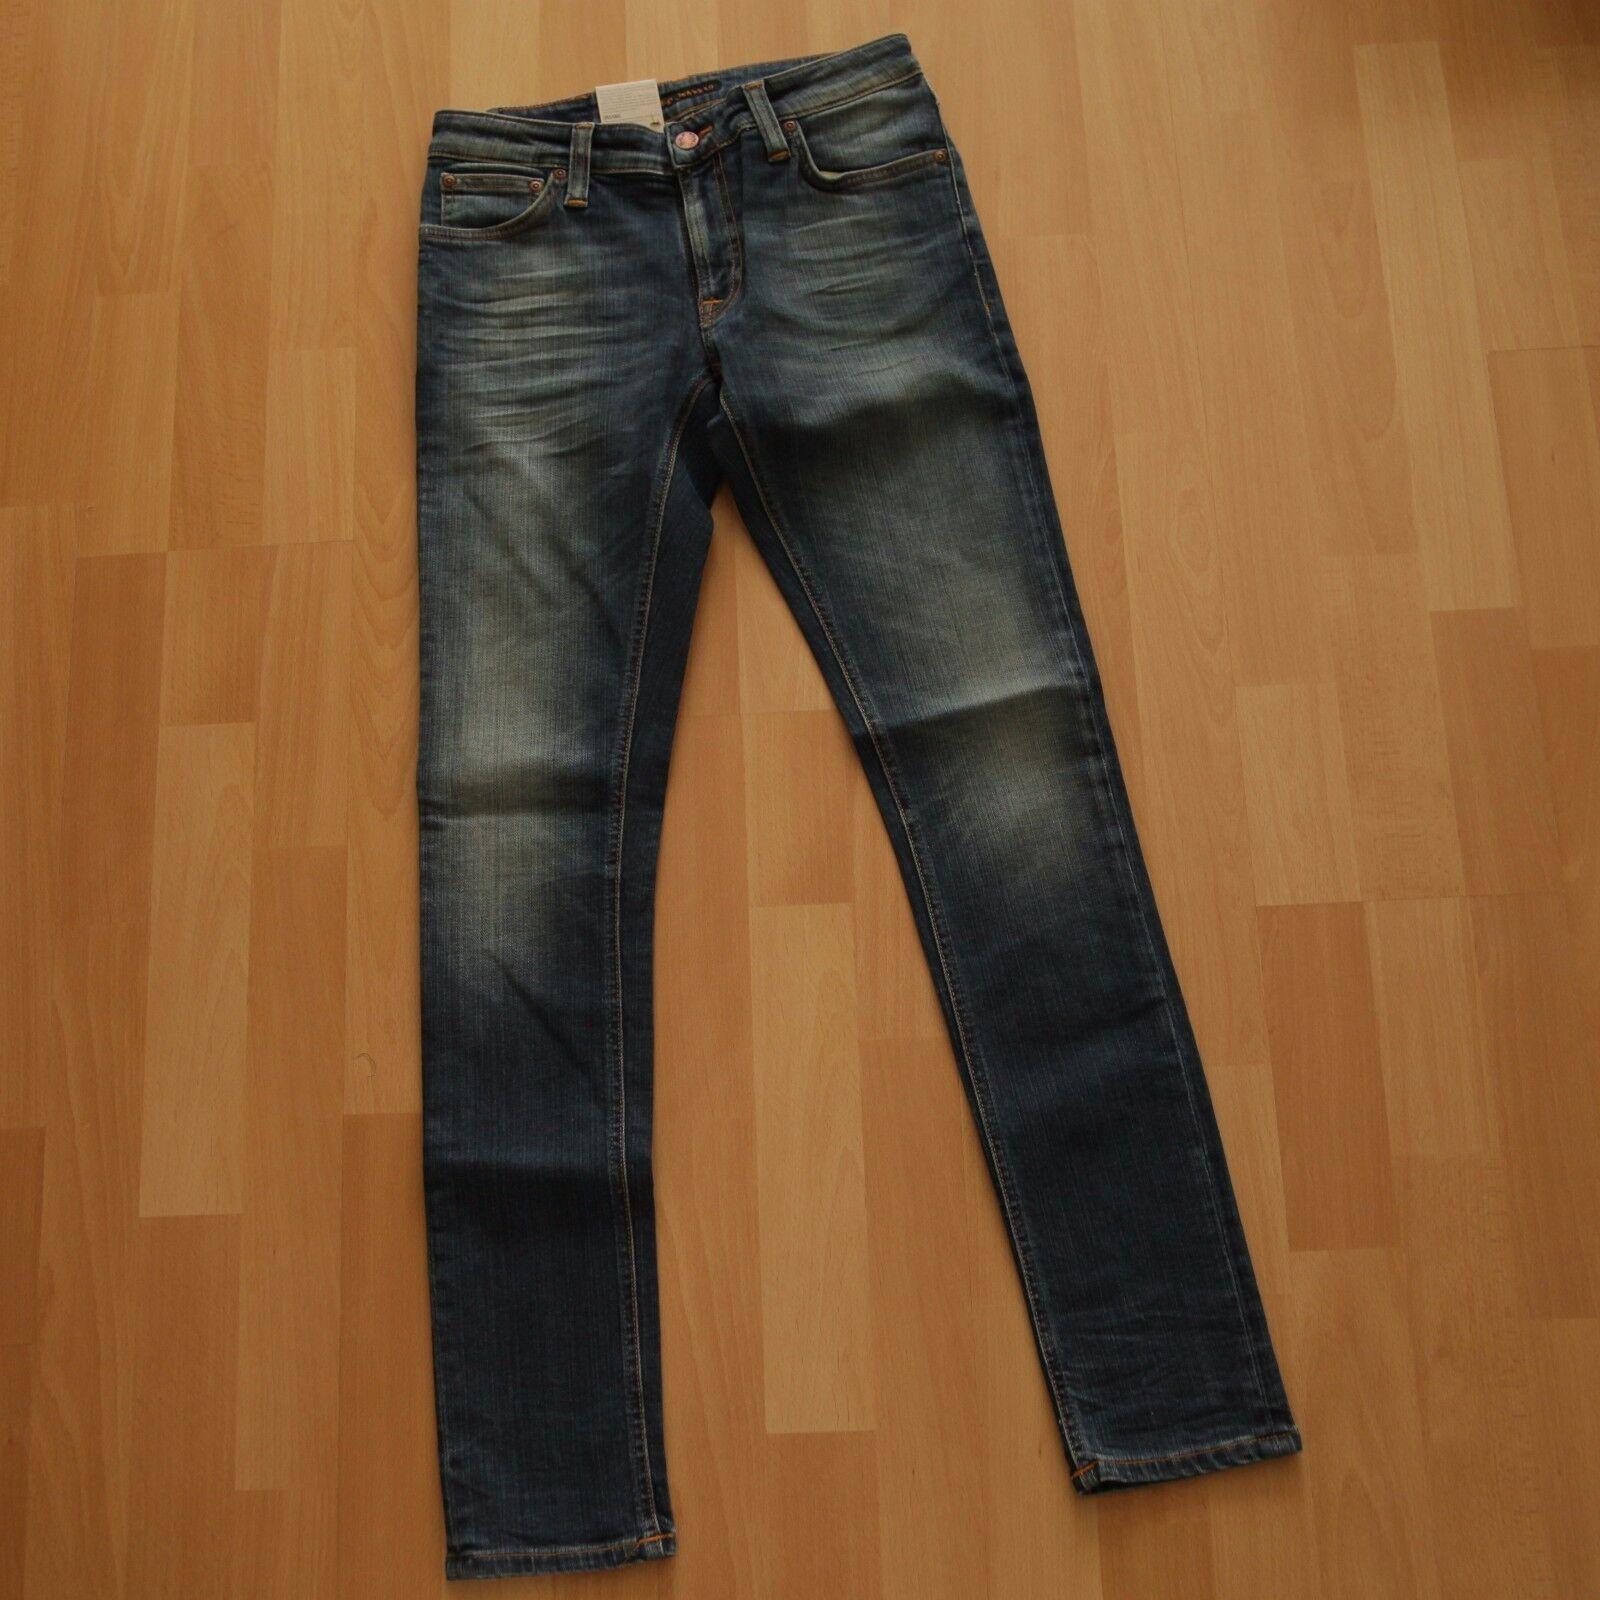 NUOVO Nudie Jeans Skinny Lin (skinny legs) Organic Sharp WORN WORN WORN 28 32 93b3fc